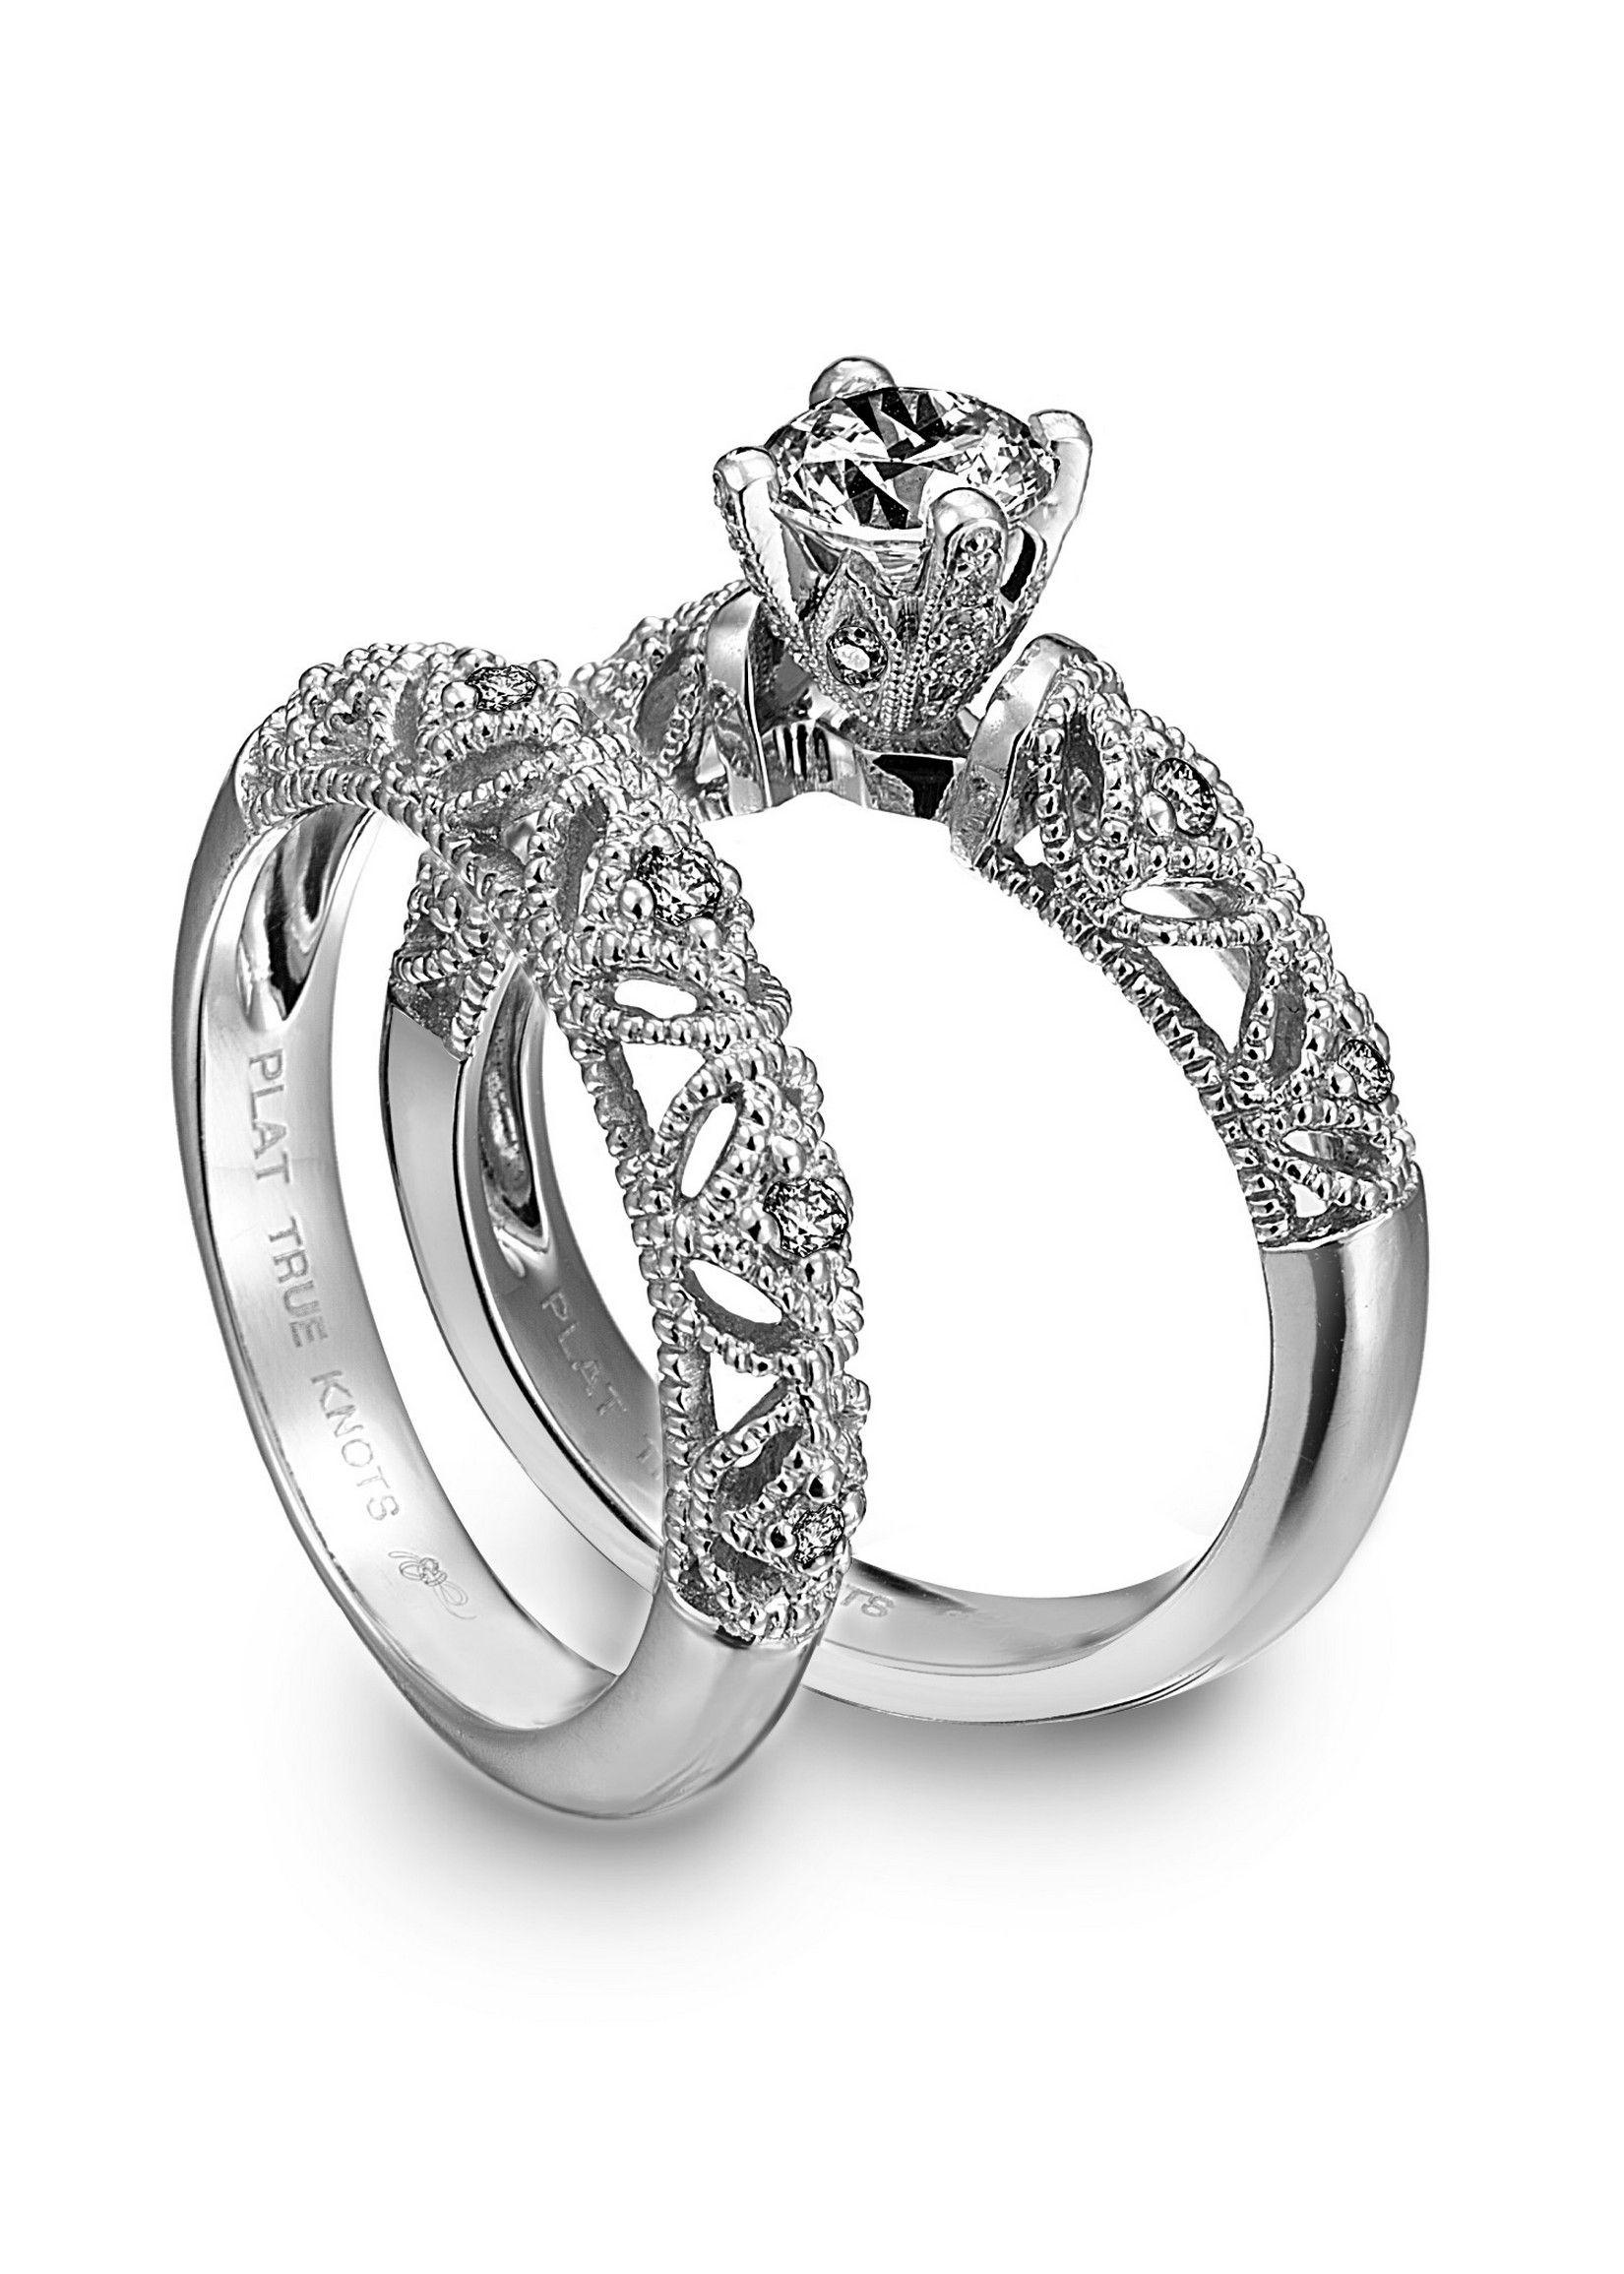 Custom Wedding Rings Latest Wedding Rings Design